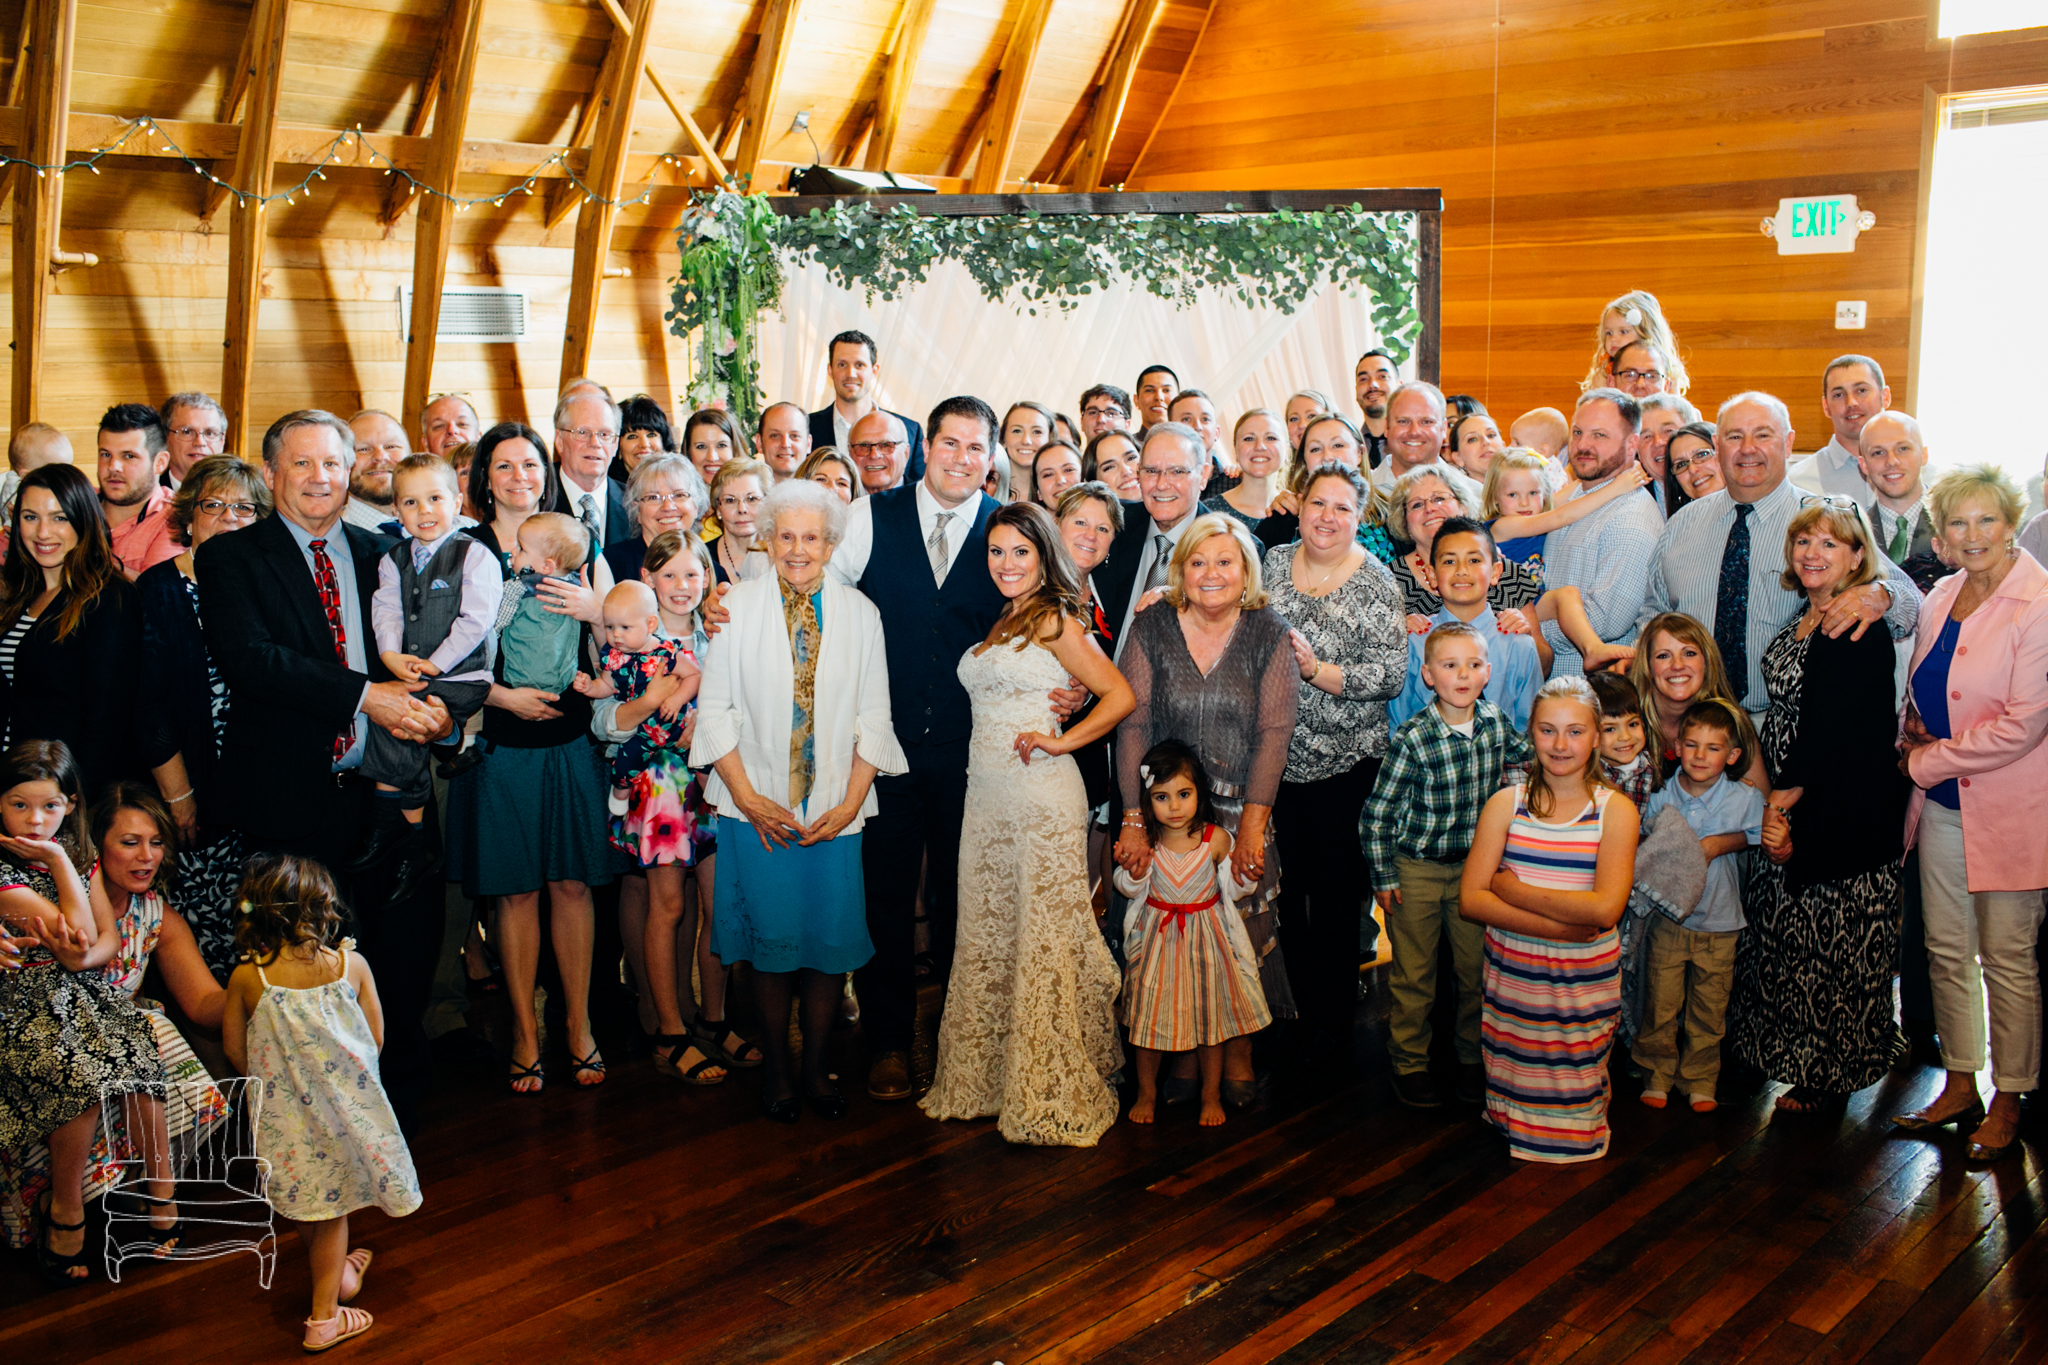 seattle-wedding-photographer-katheryn-moran-russells-bothell-wilkins-wedding-photo-60.jpg